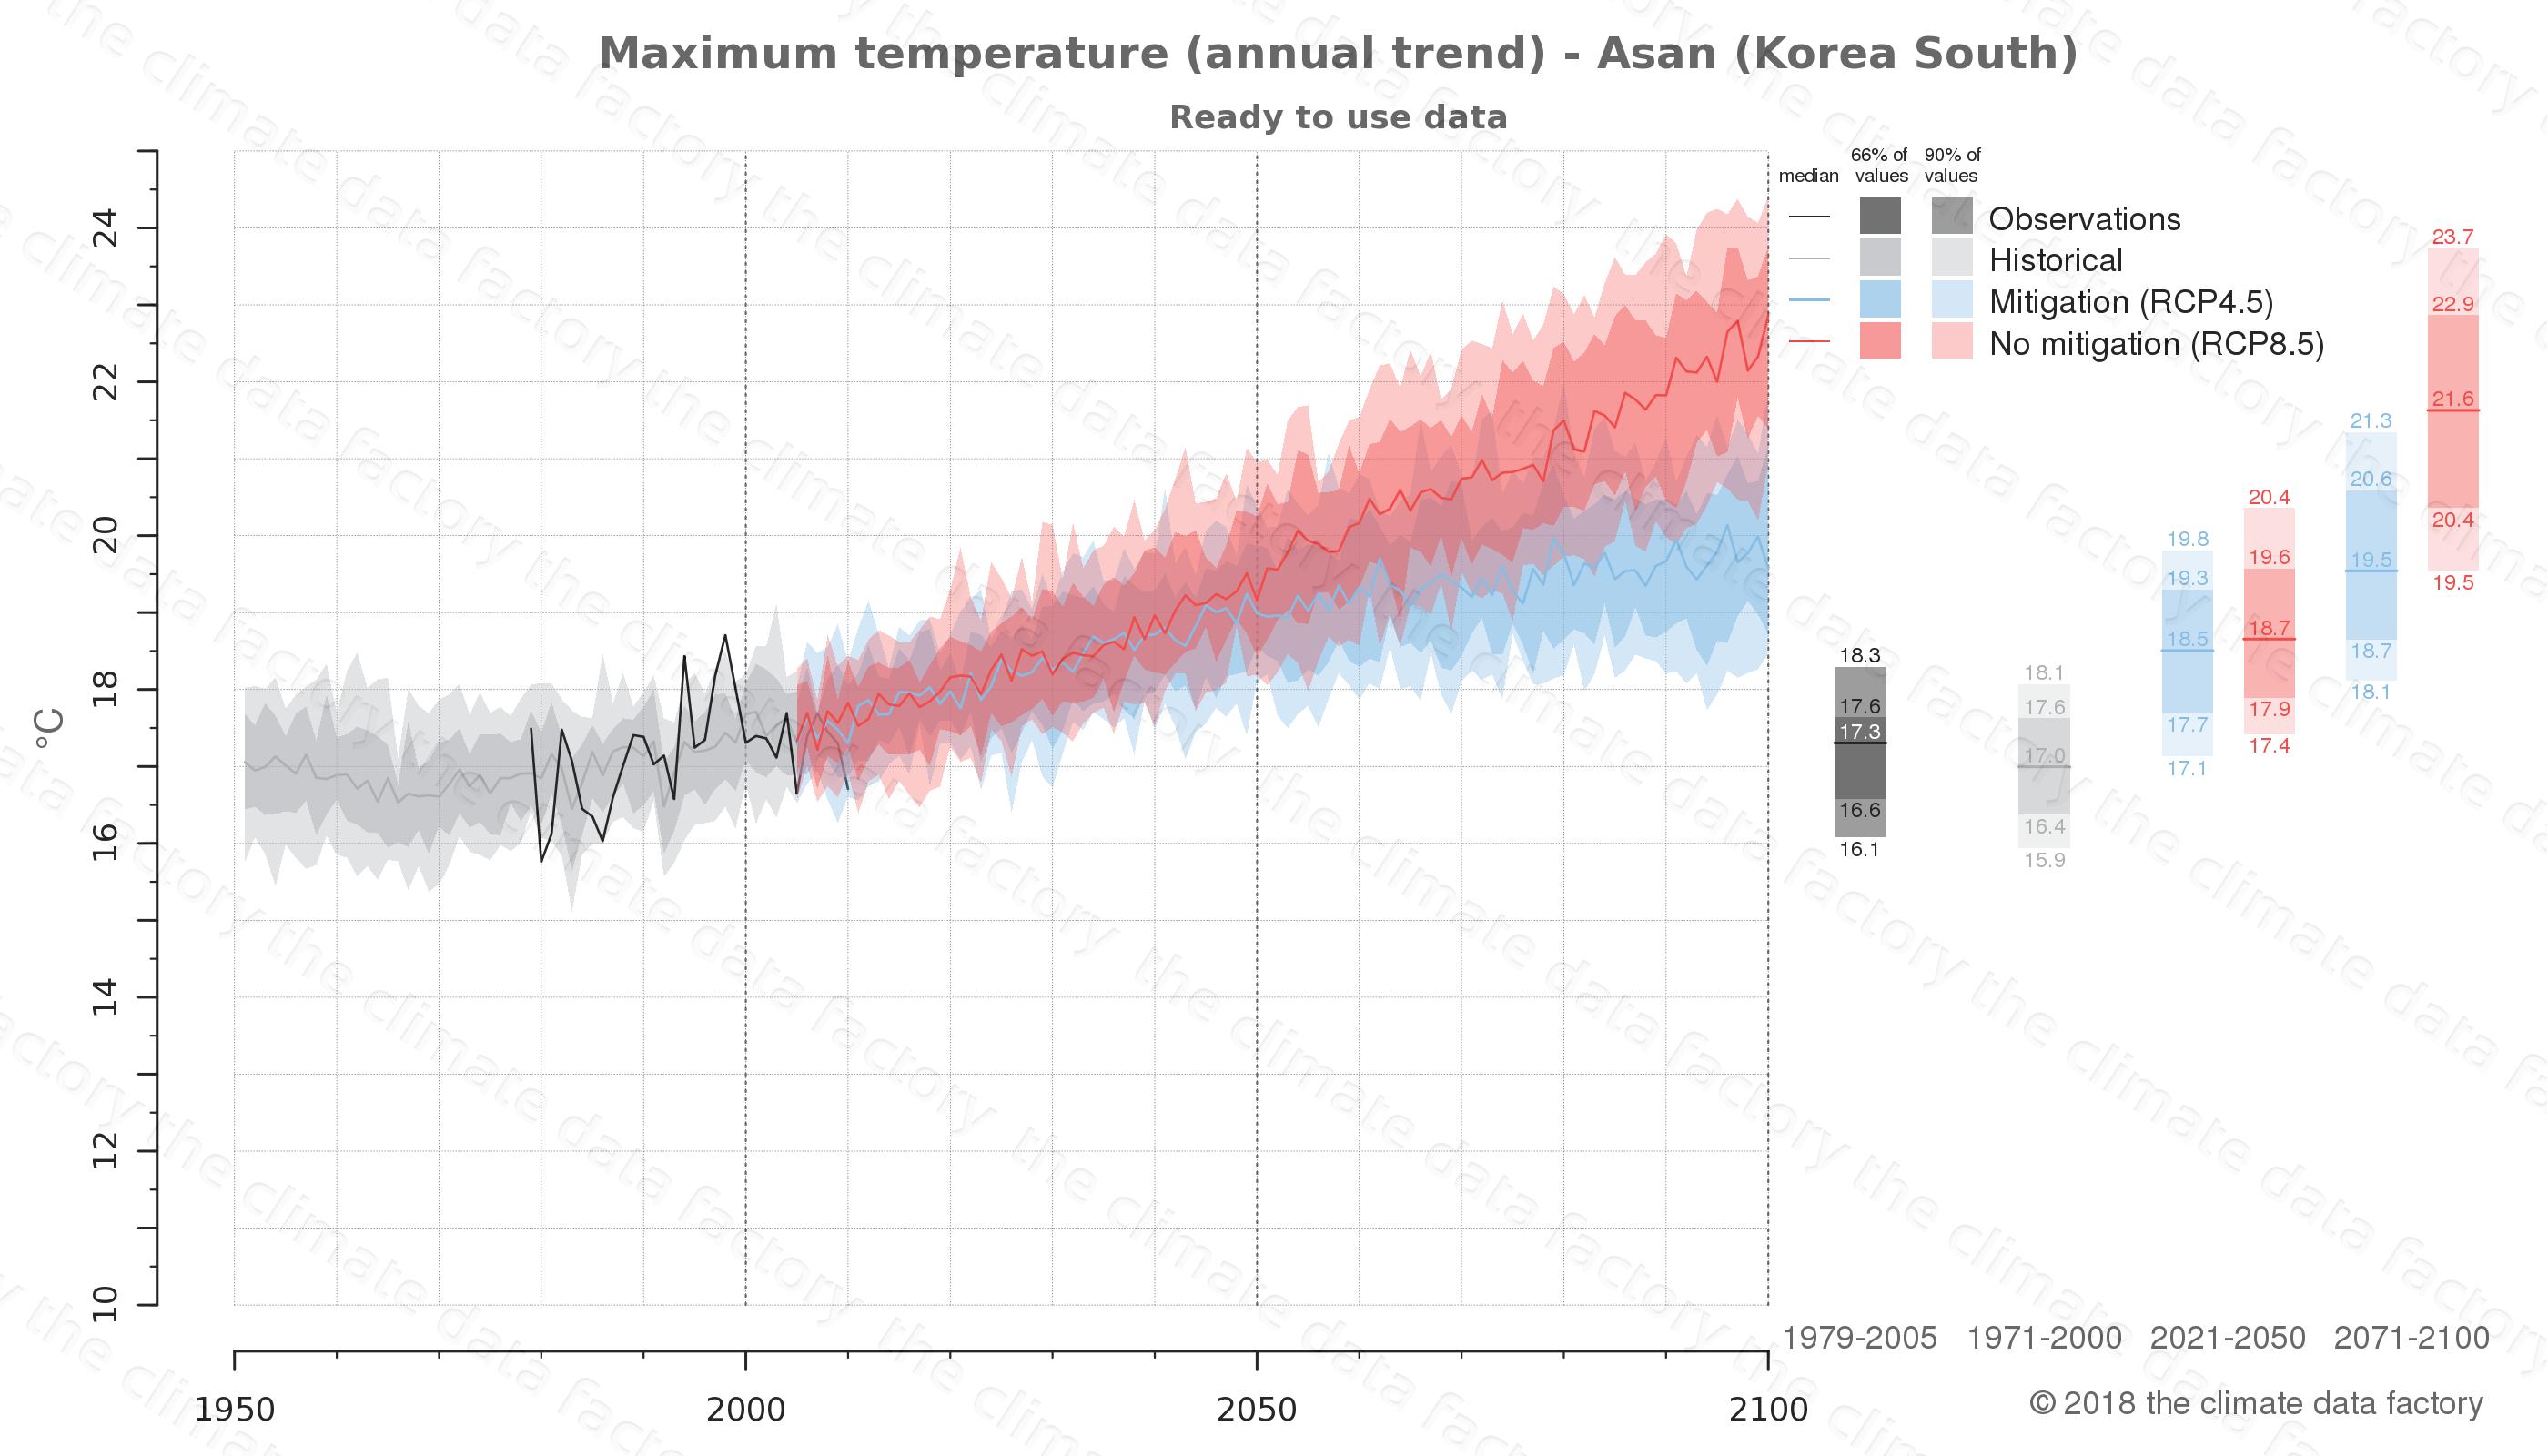 climate change data policy adaptation climate graph city data maximum-temperature asan south korea